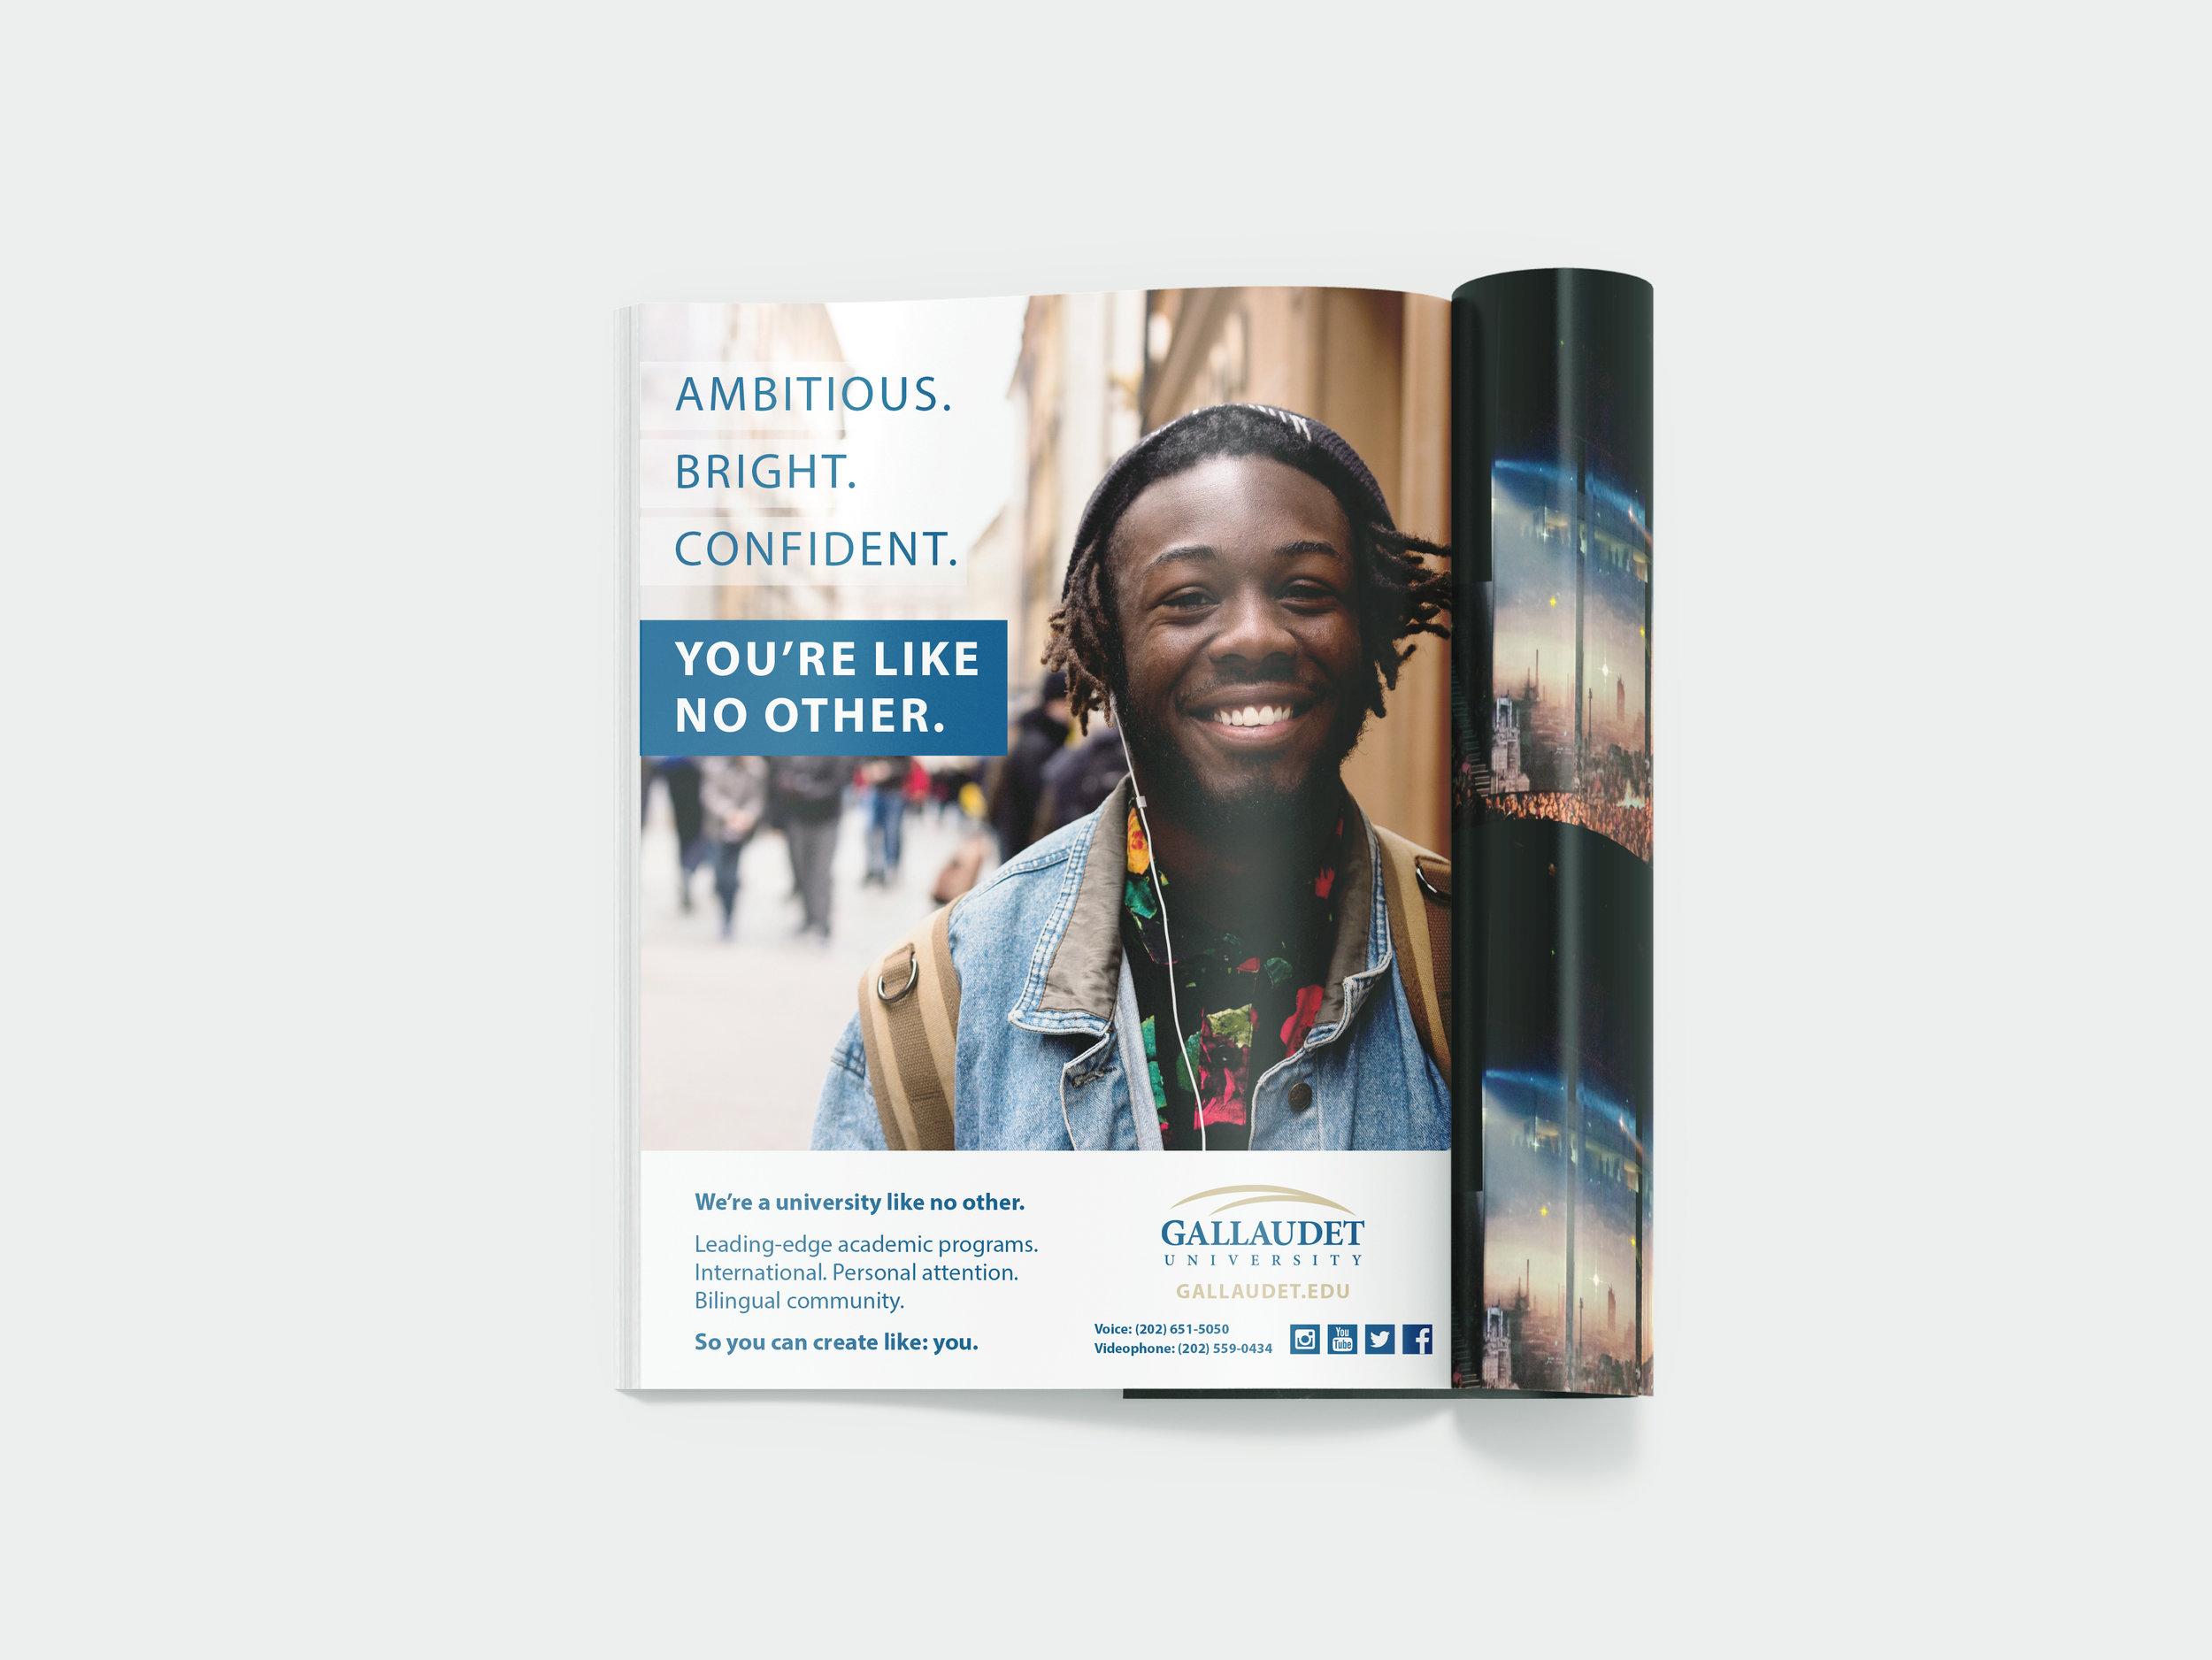 Gallaudet-University-Branding-Marketing-Advertising.jpg